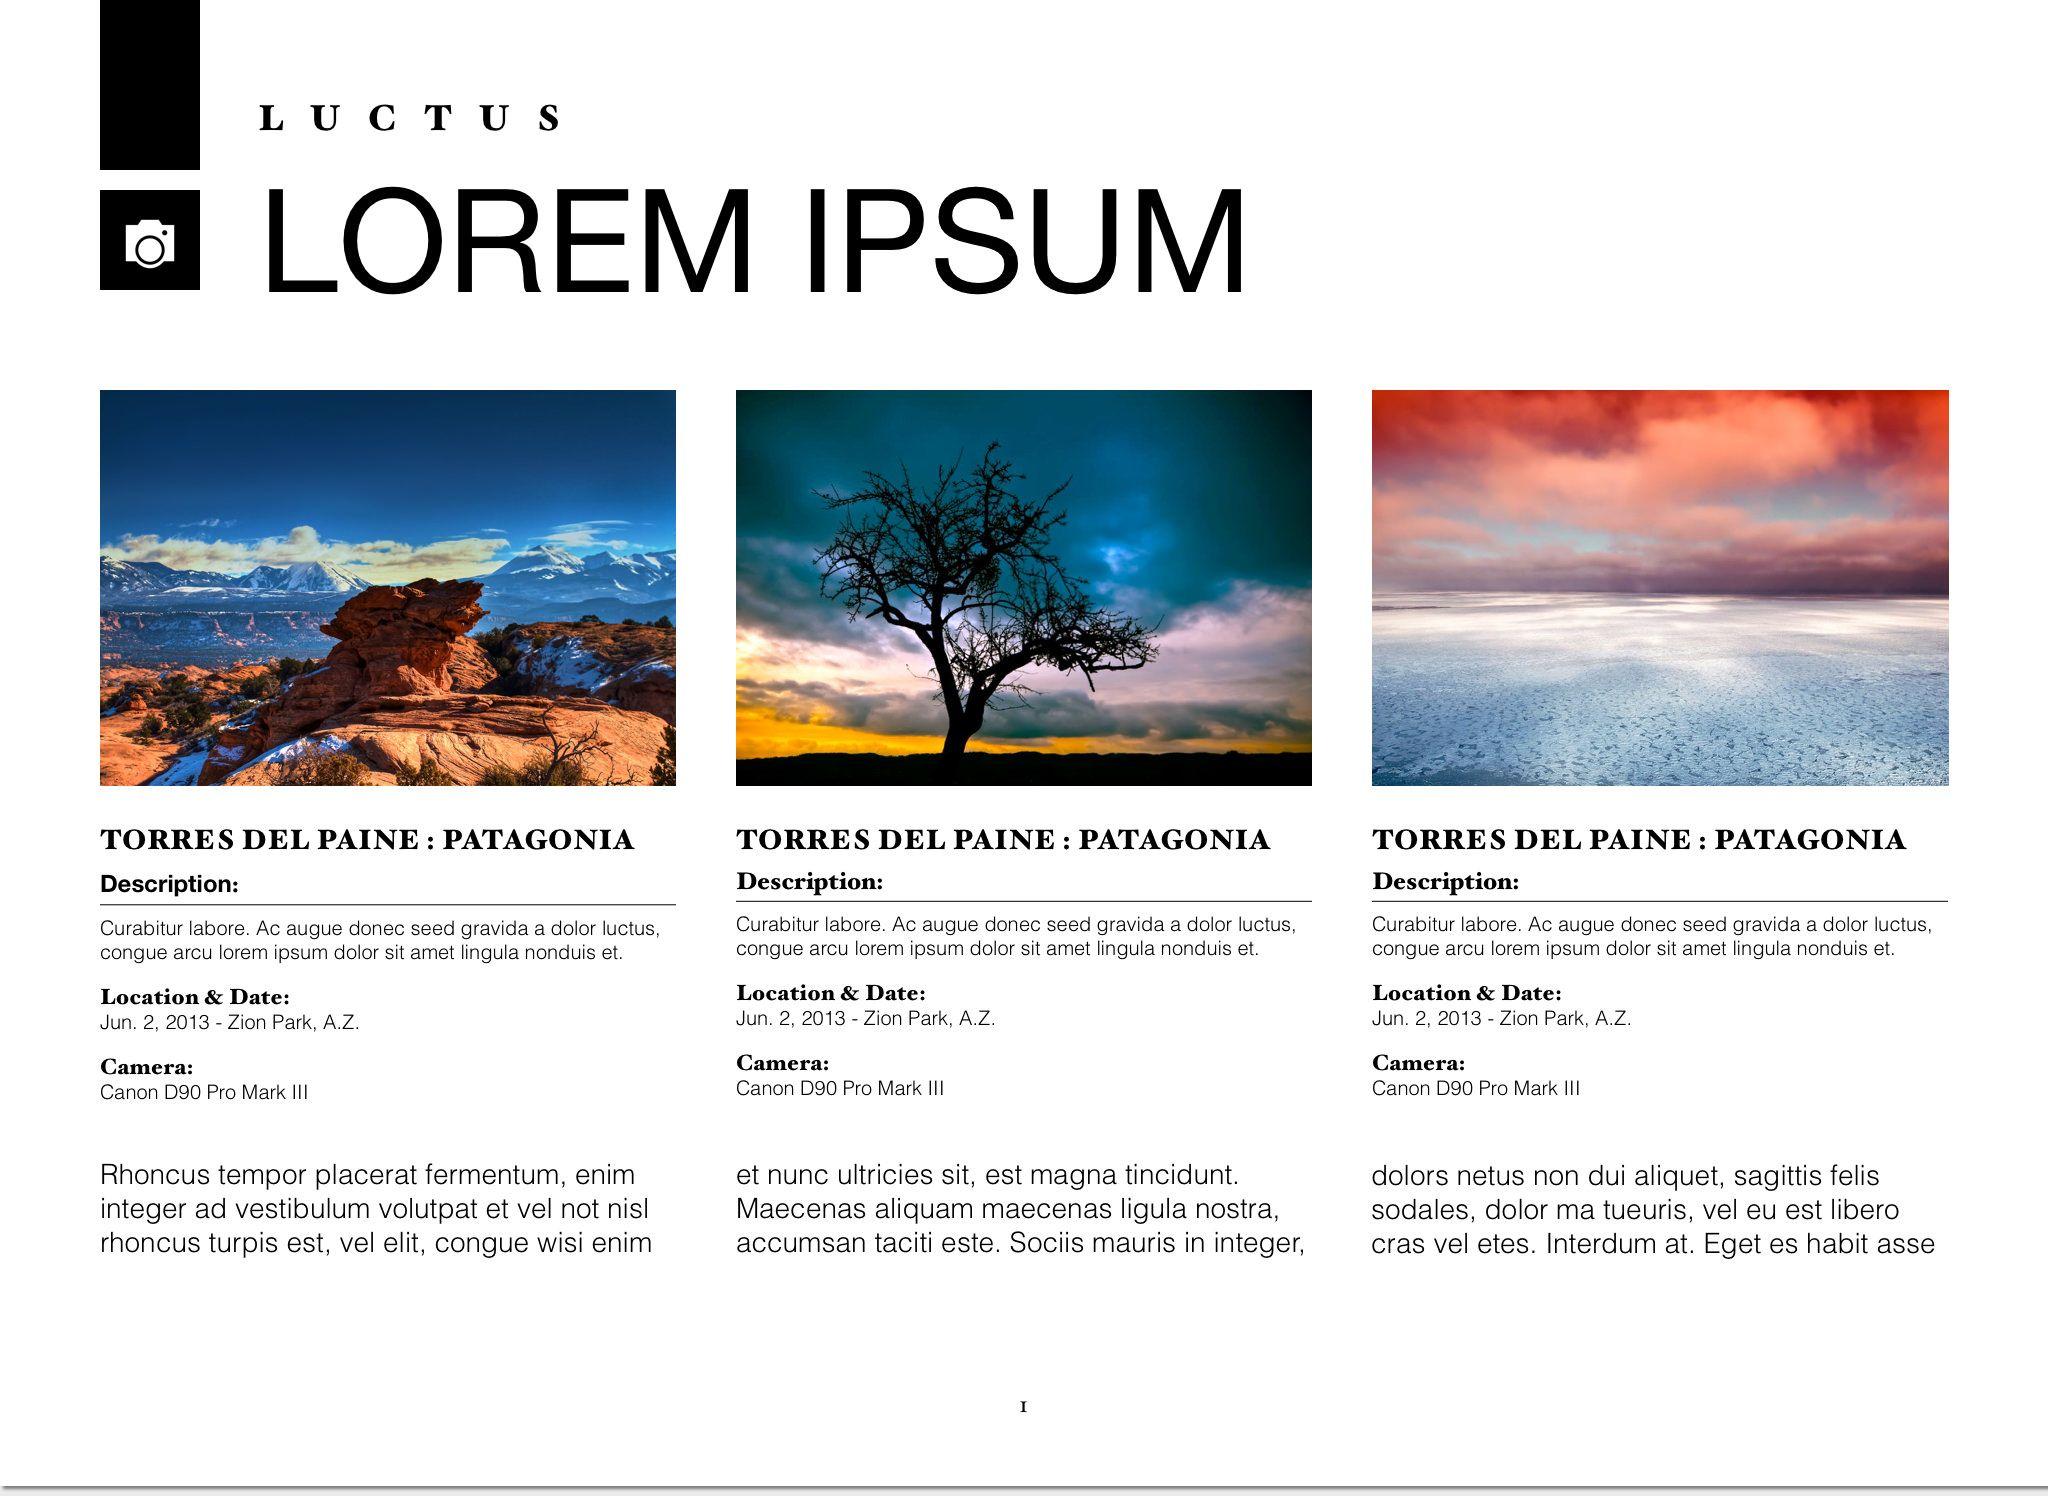 Plantilla Photo Pro para iBooks Author, disponible en http ...